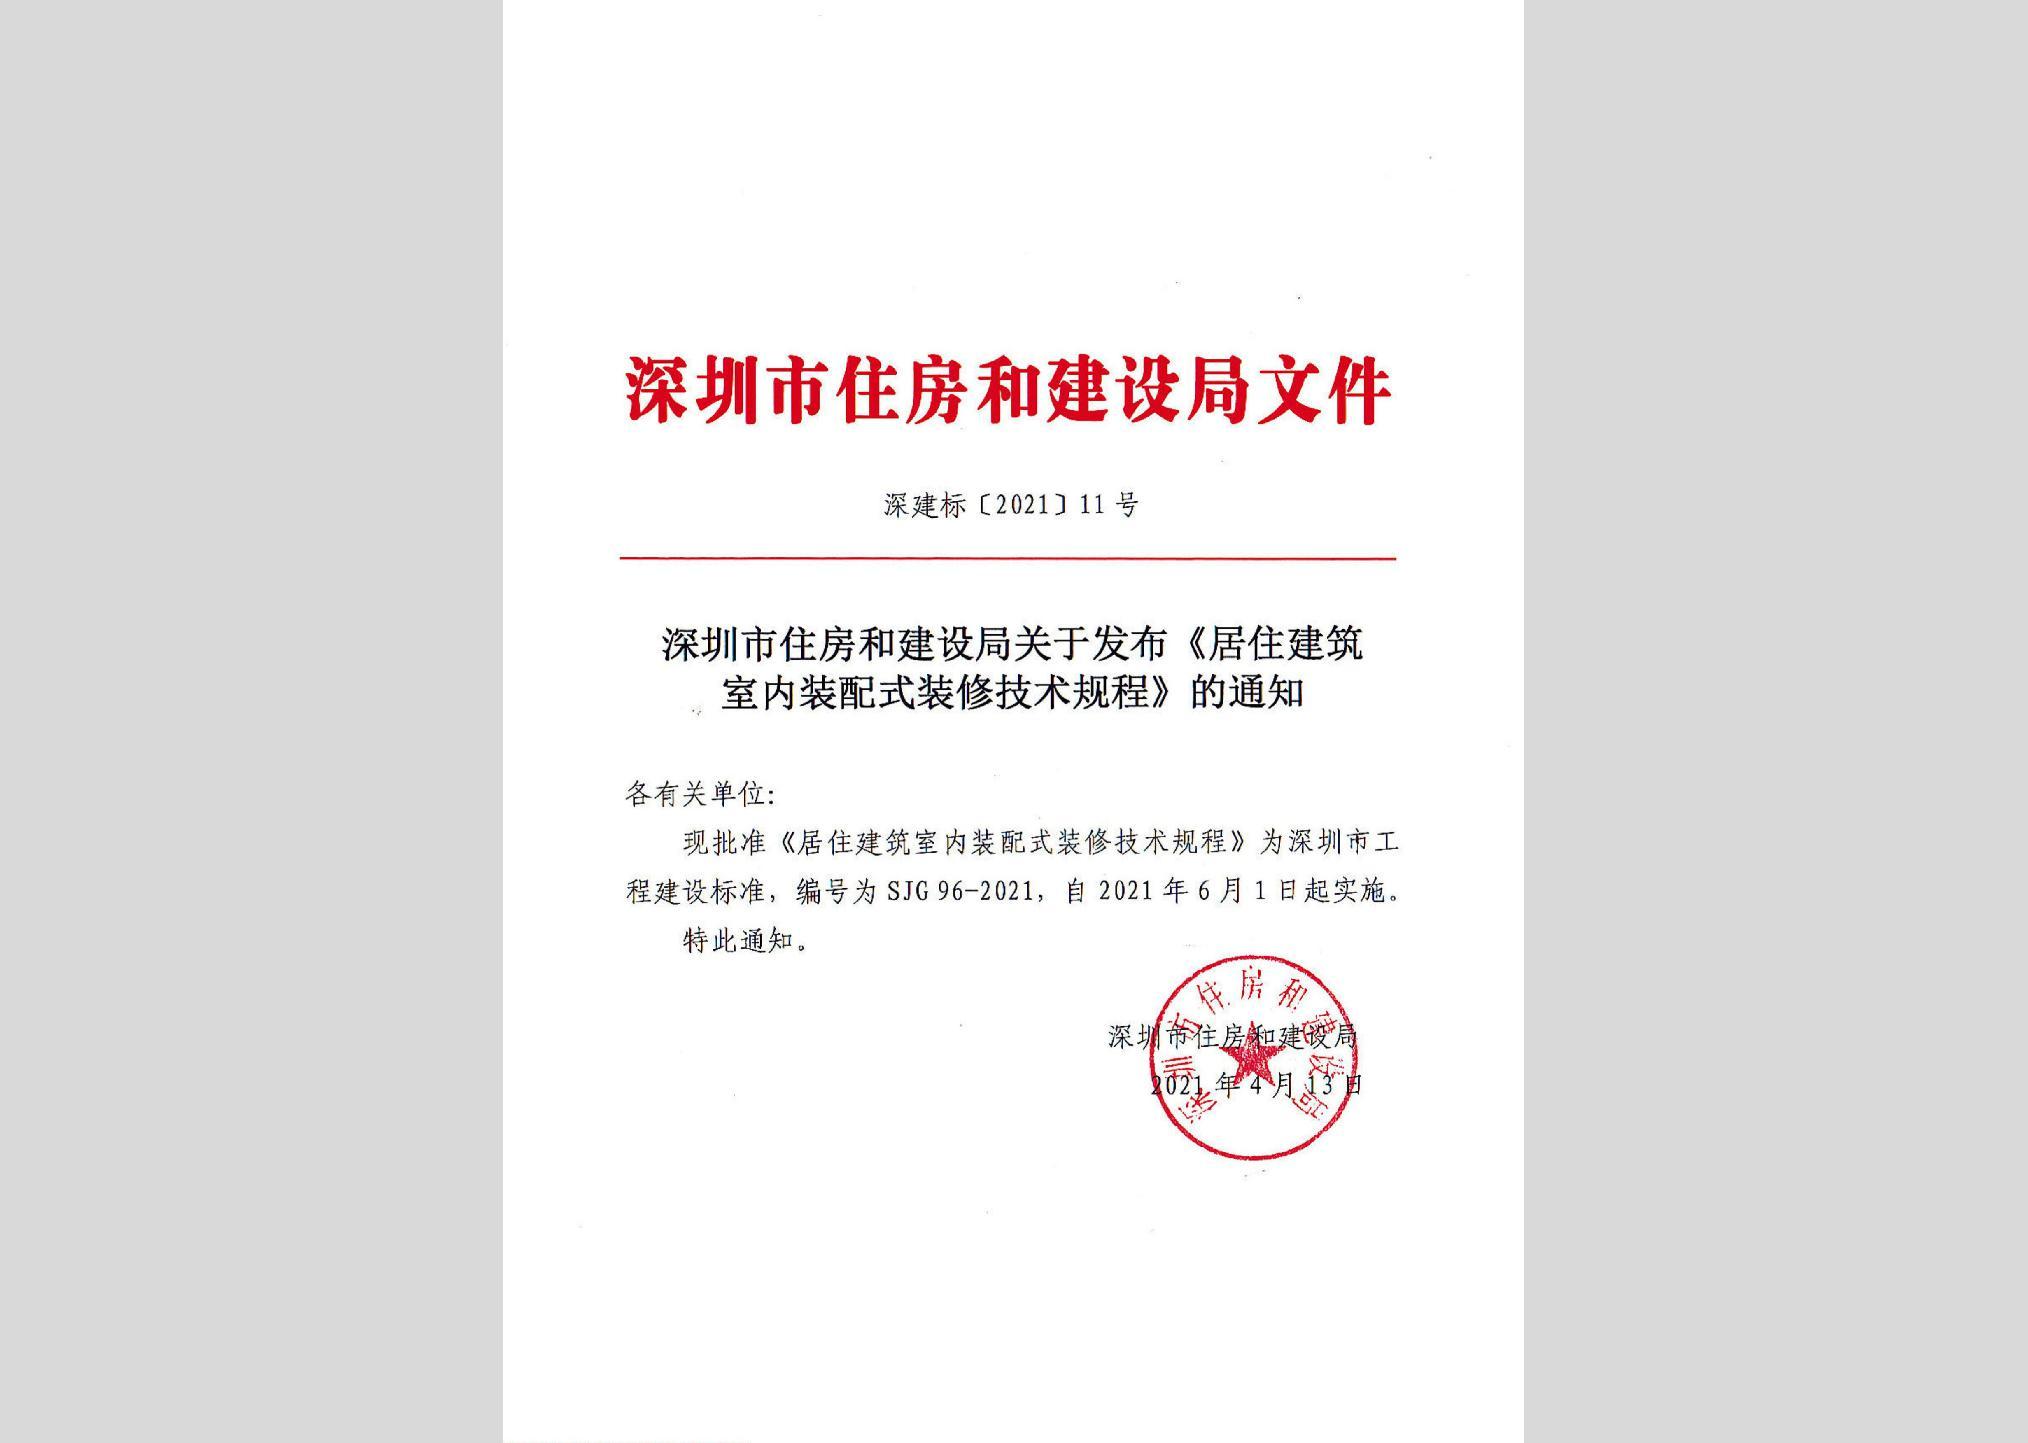 SJG96-2021:居住建筑室内装配式装修技术规程